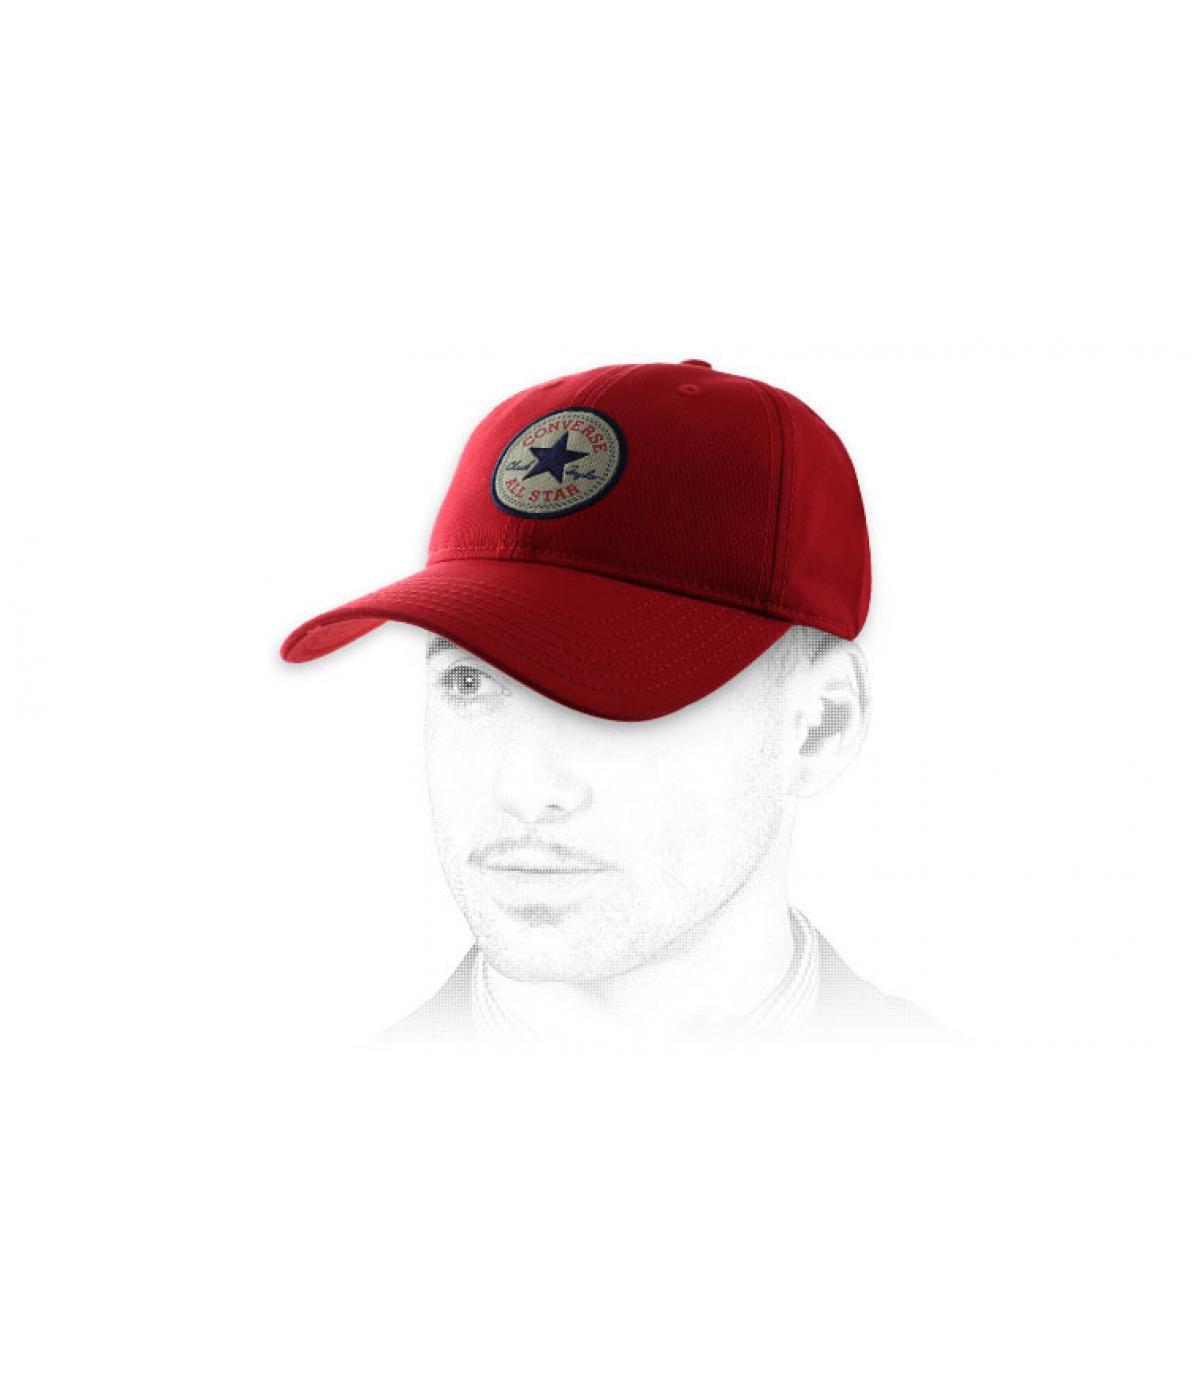 casquette curve Converse rouge